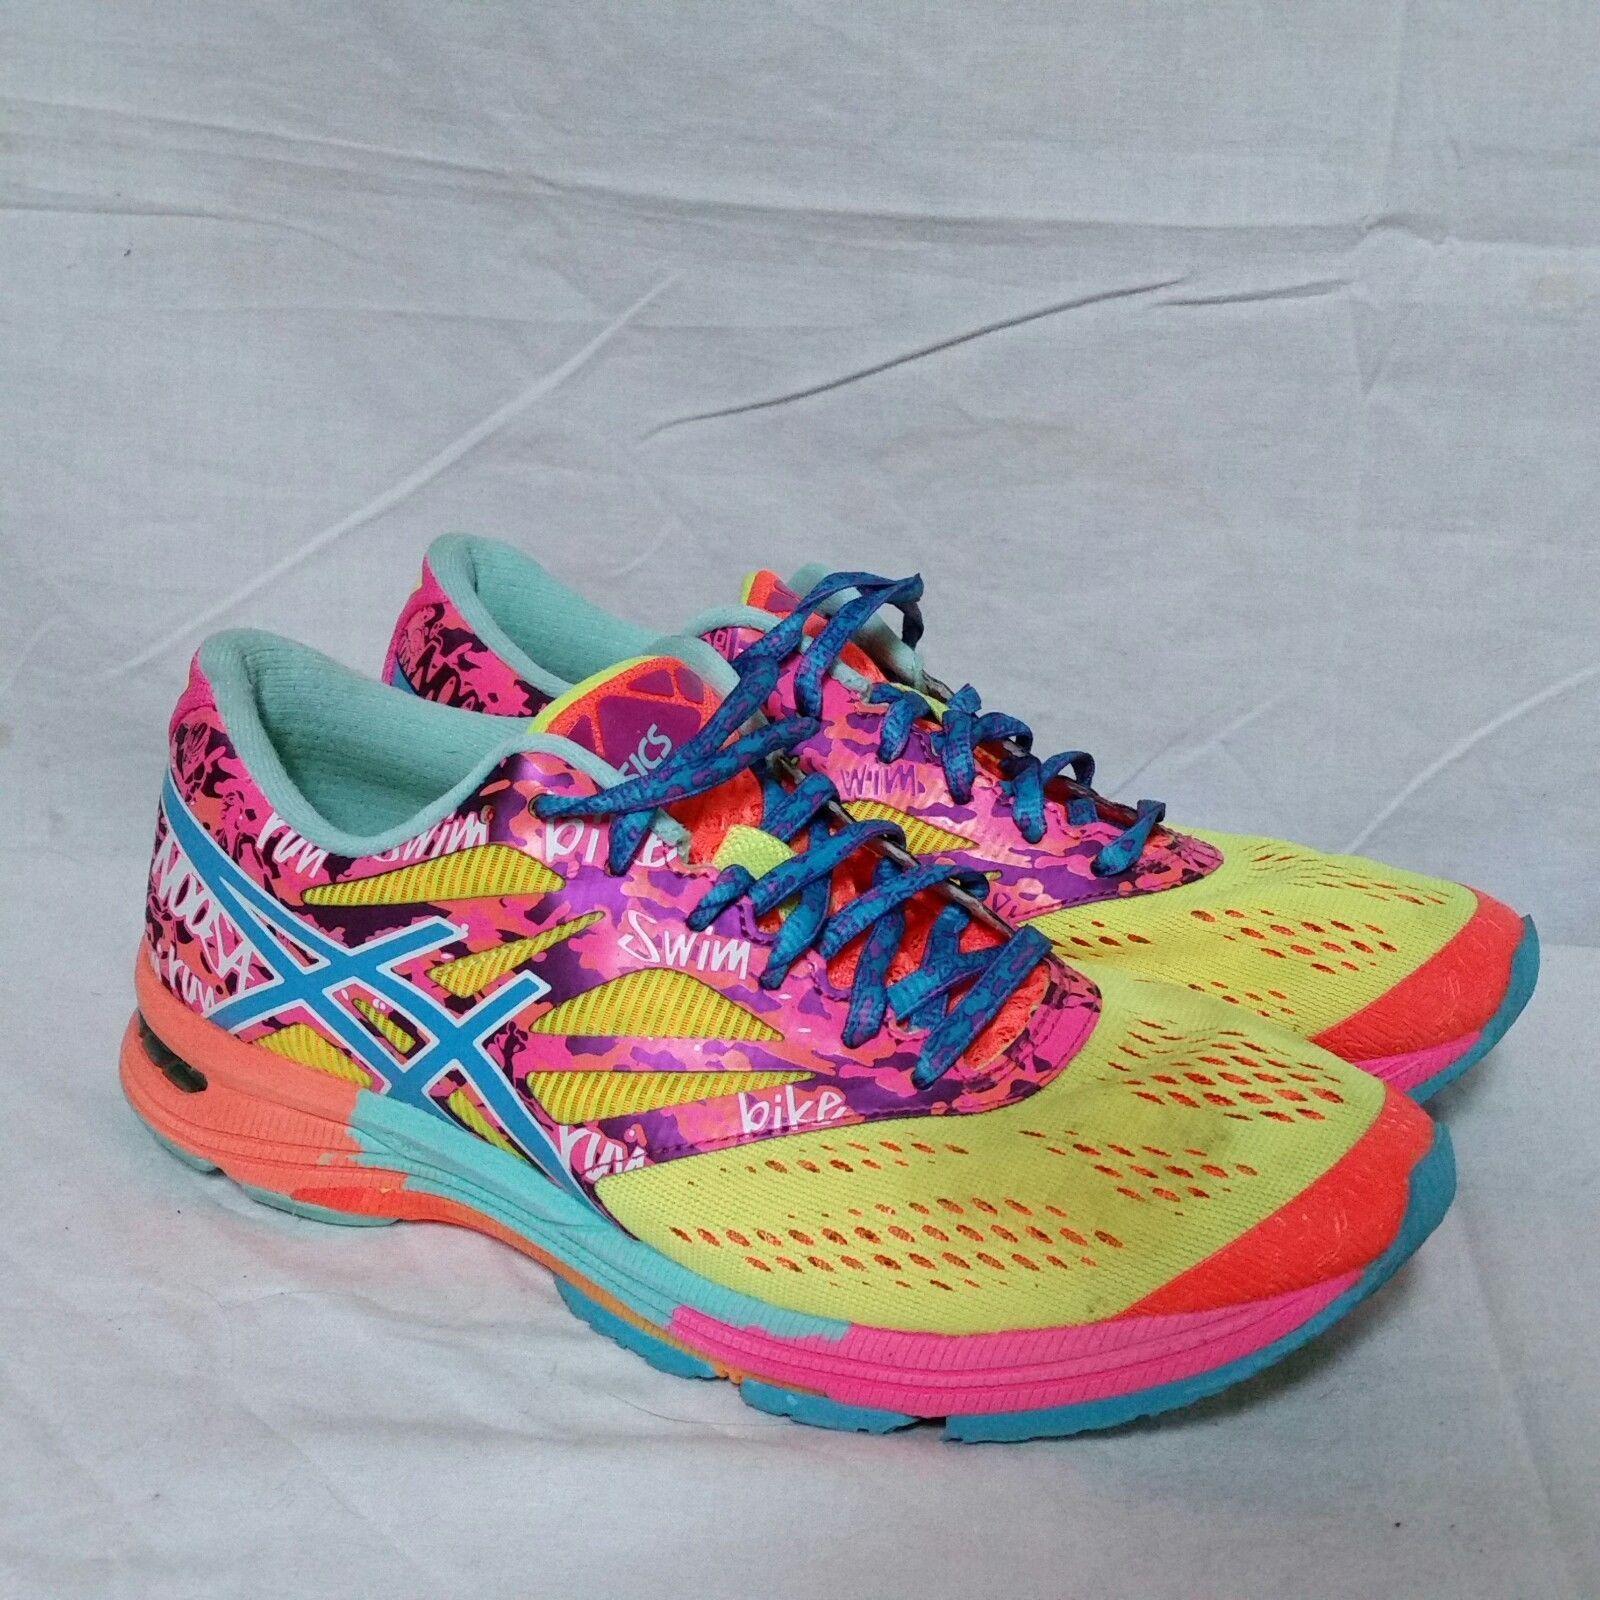 7836b276f Asics Gel Noosa Tri 10 Running Shoes Rainbow and 50 similar items